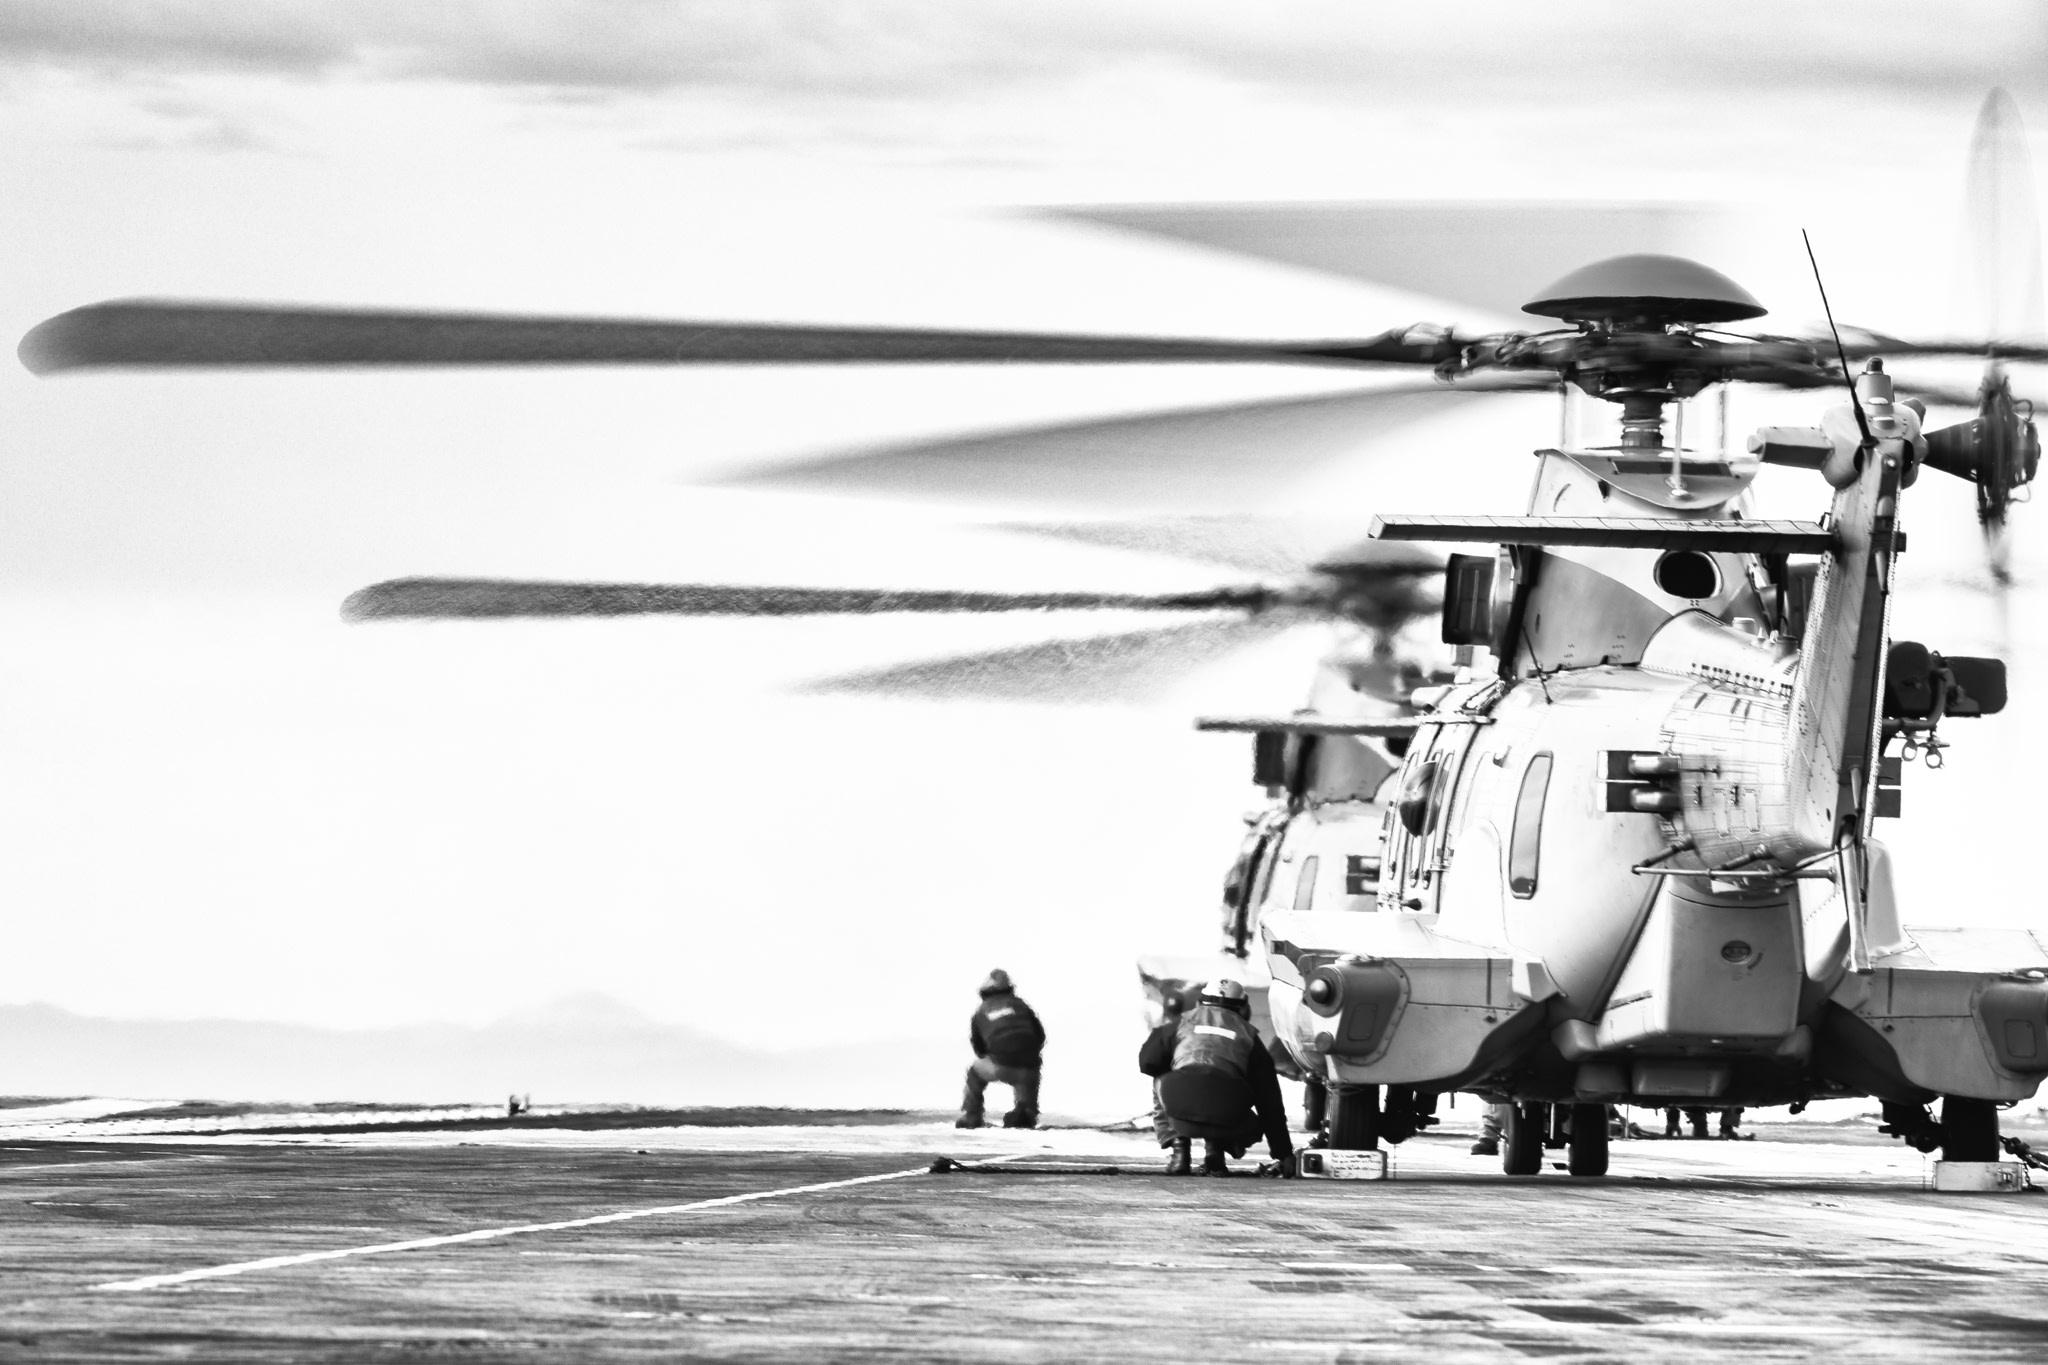 Photographie hélicoptère NZ70197